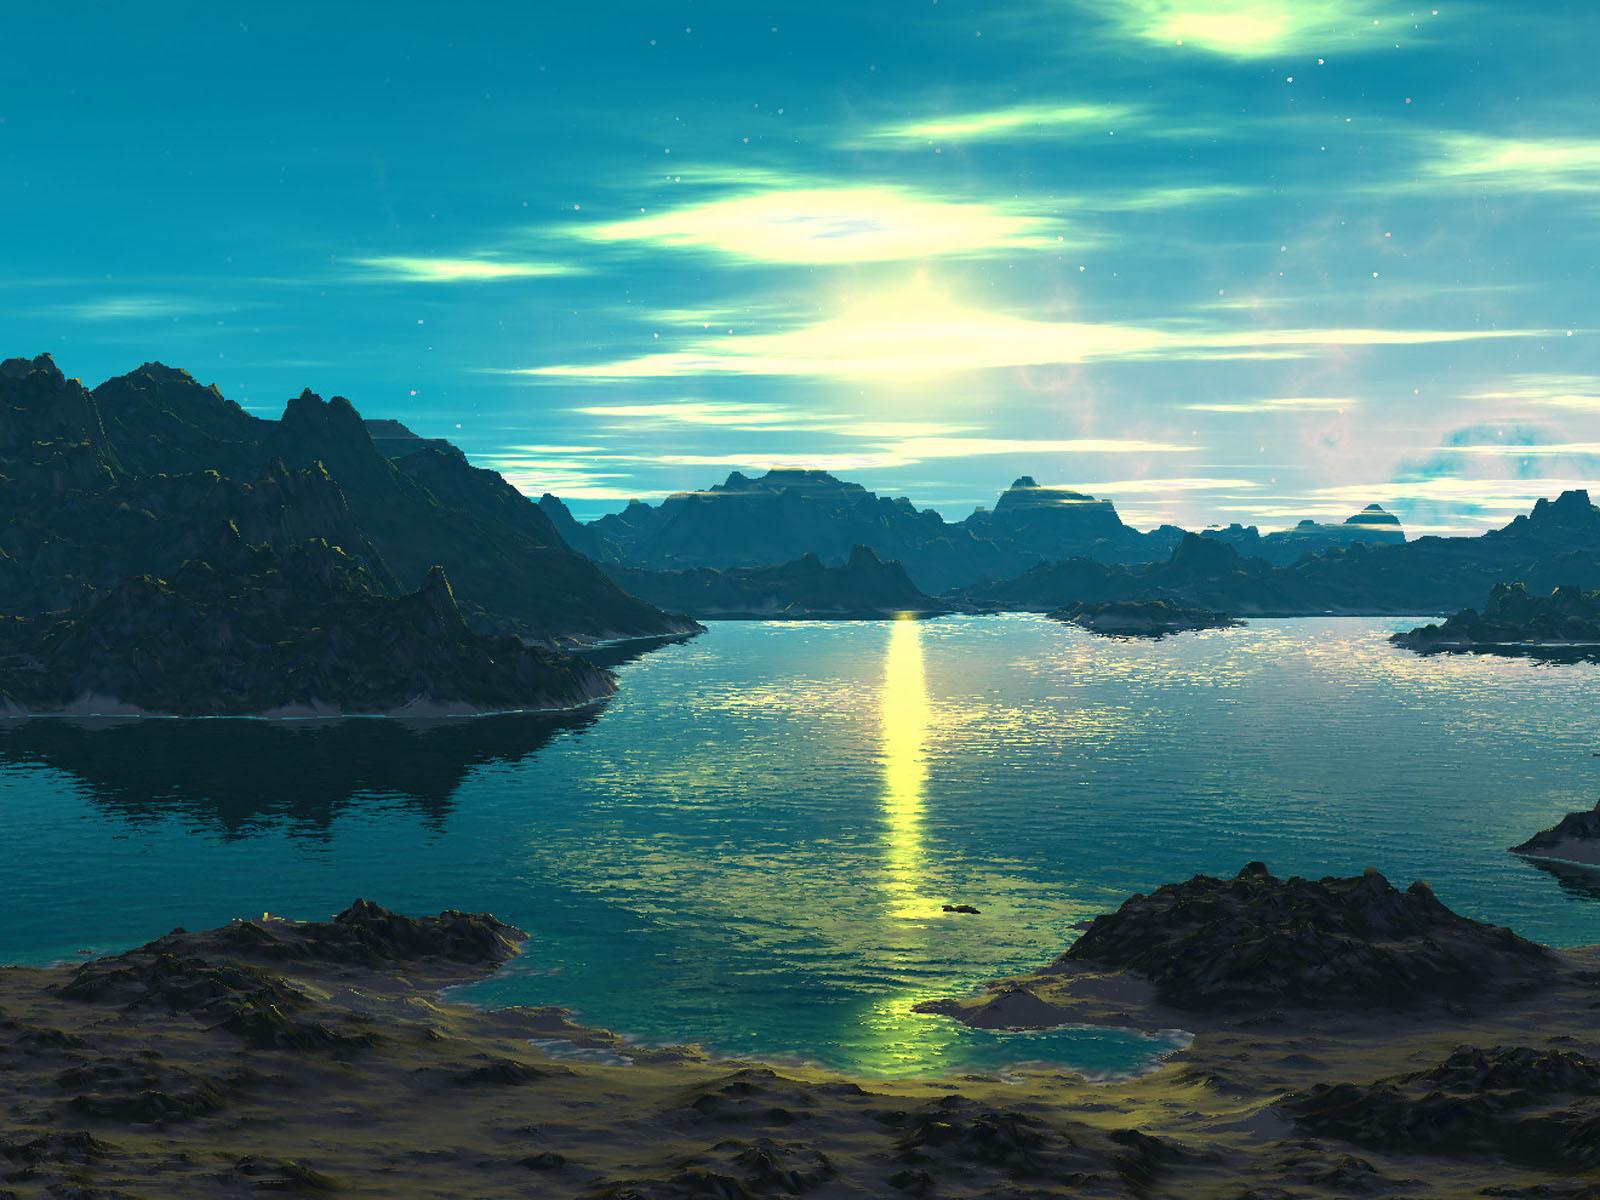 alien sunset wallpaper - photo #4